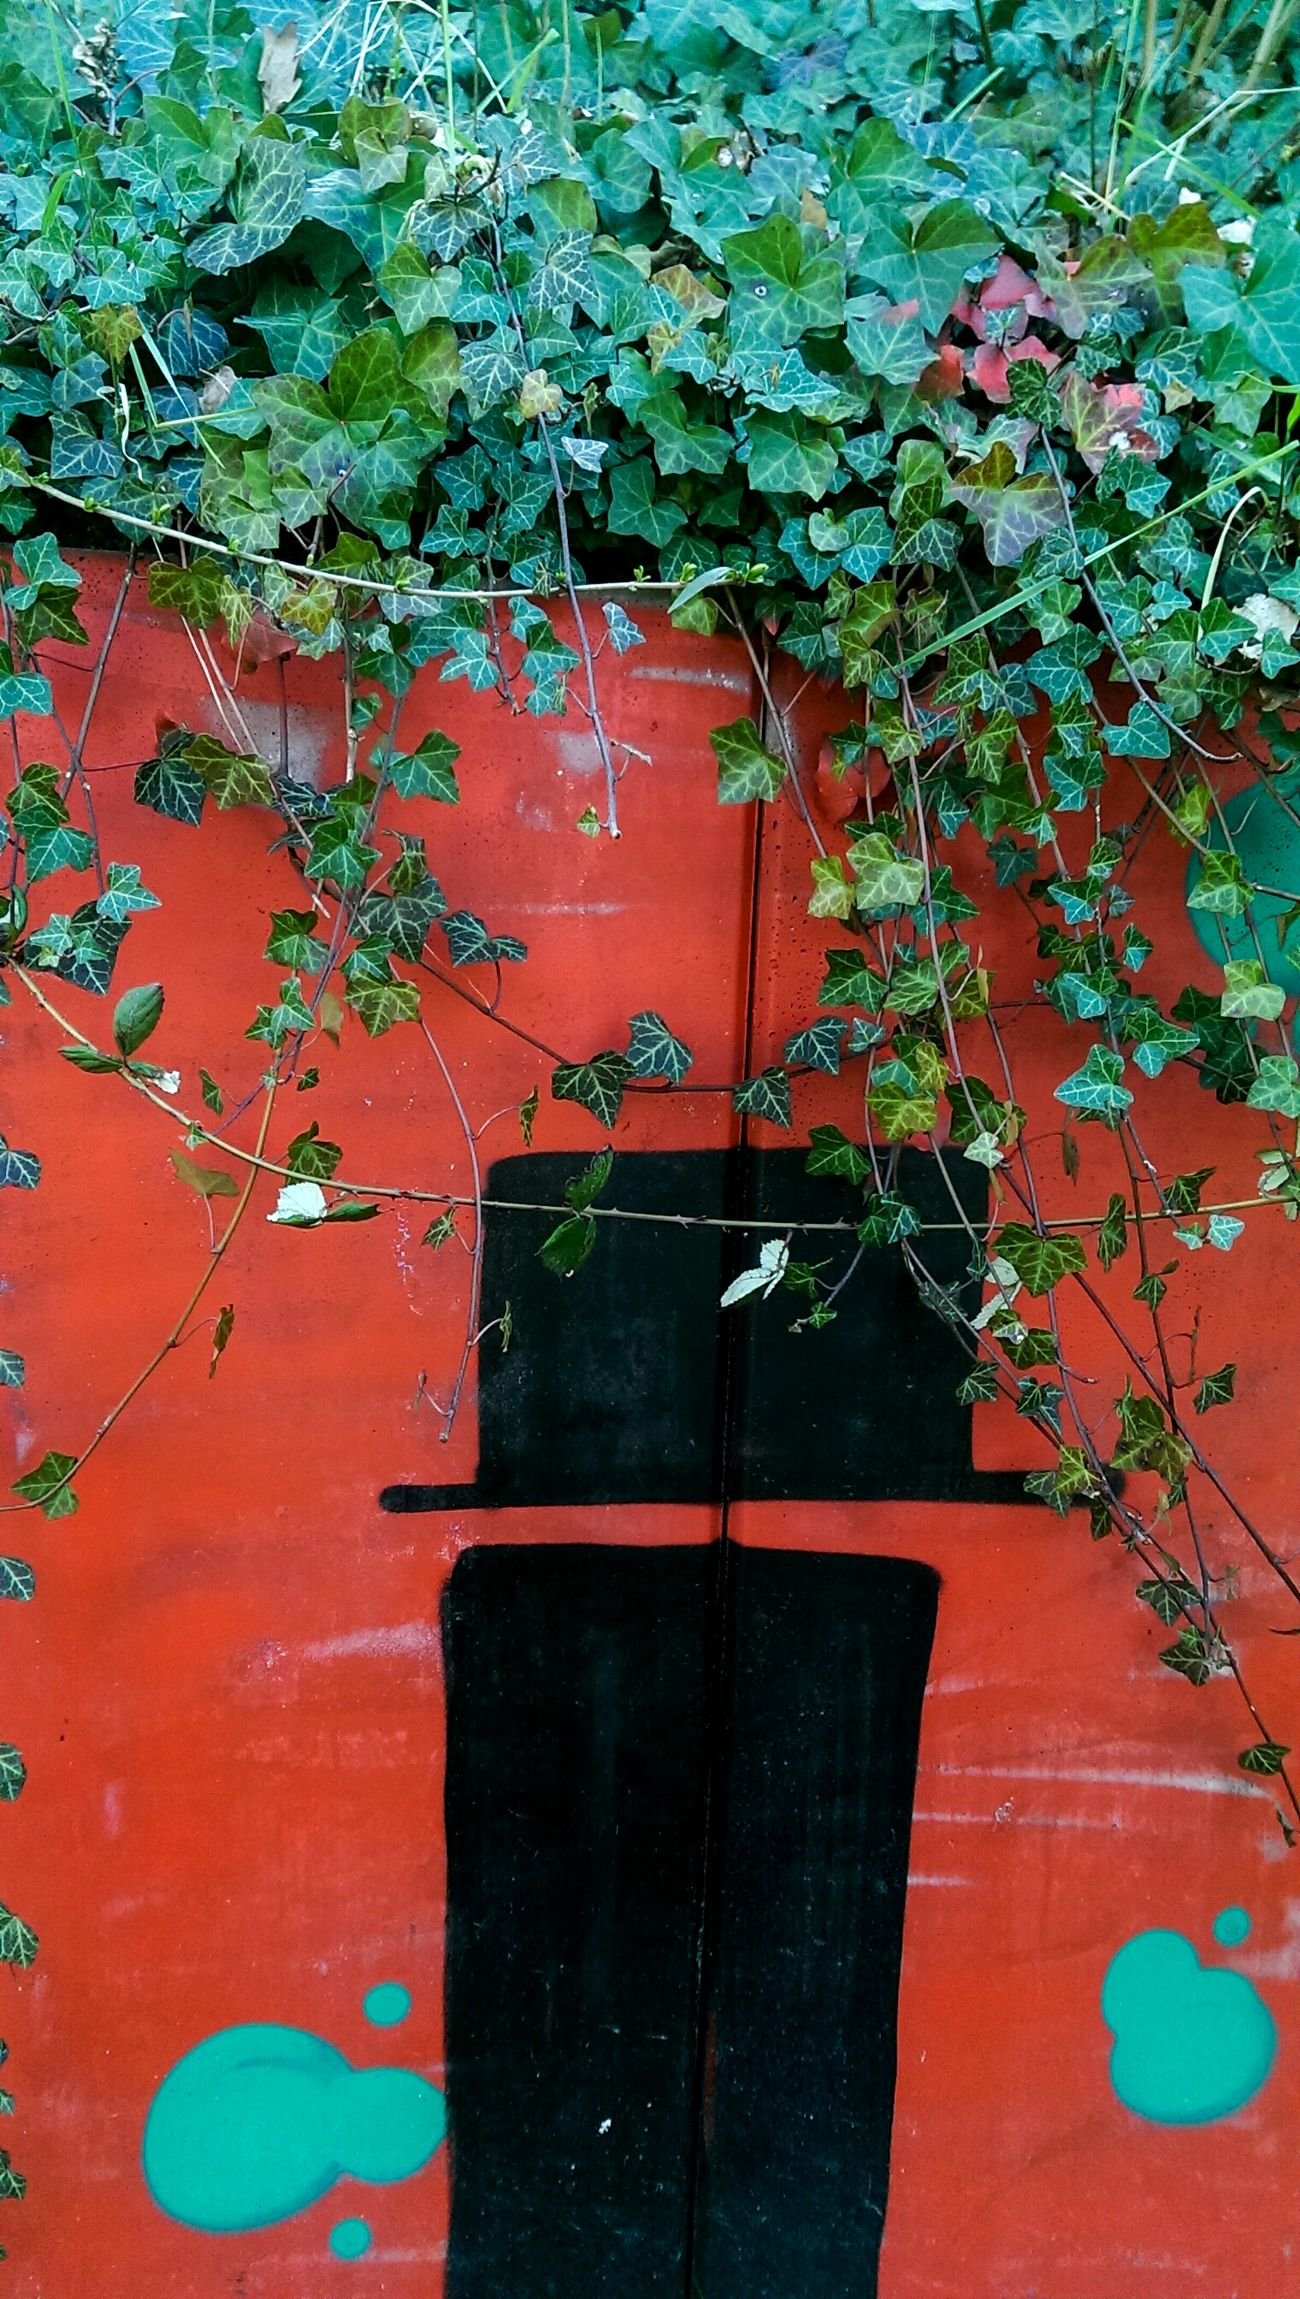 Enchanted Adapted To The City Red Day No People Outdoors Nature Green Ivy Door Aliceinwonderland Passage Contrast Frankfurt Frankfurt Am Main Urban Landscape Urban City Graffiti Graffiti Art Wall Wall Art